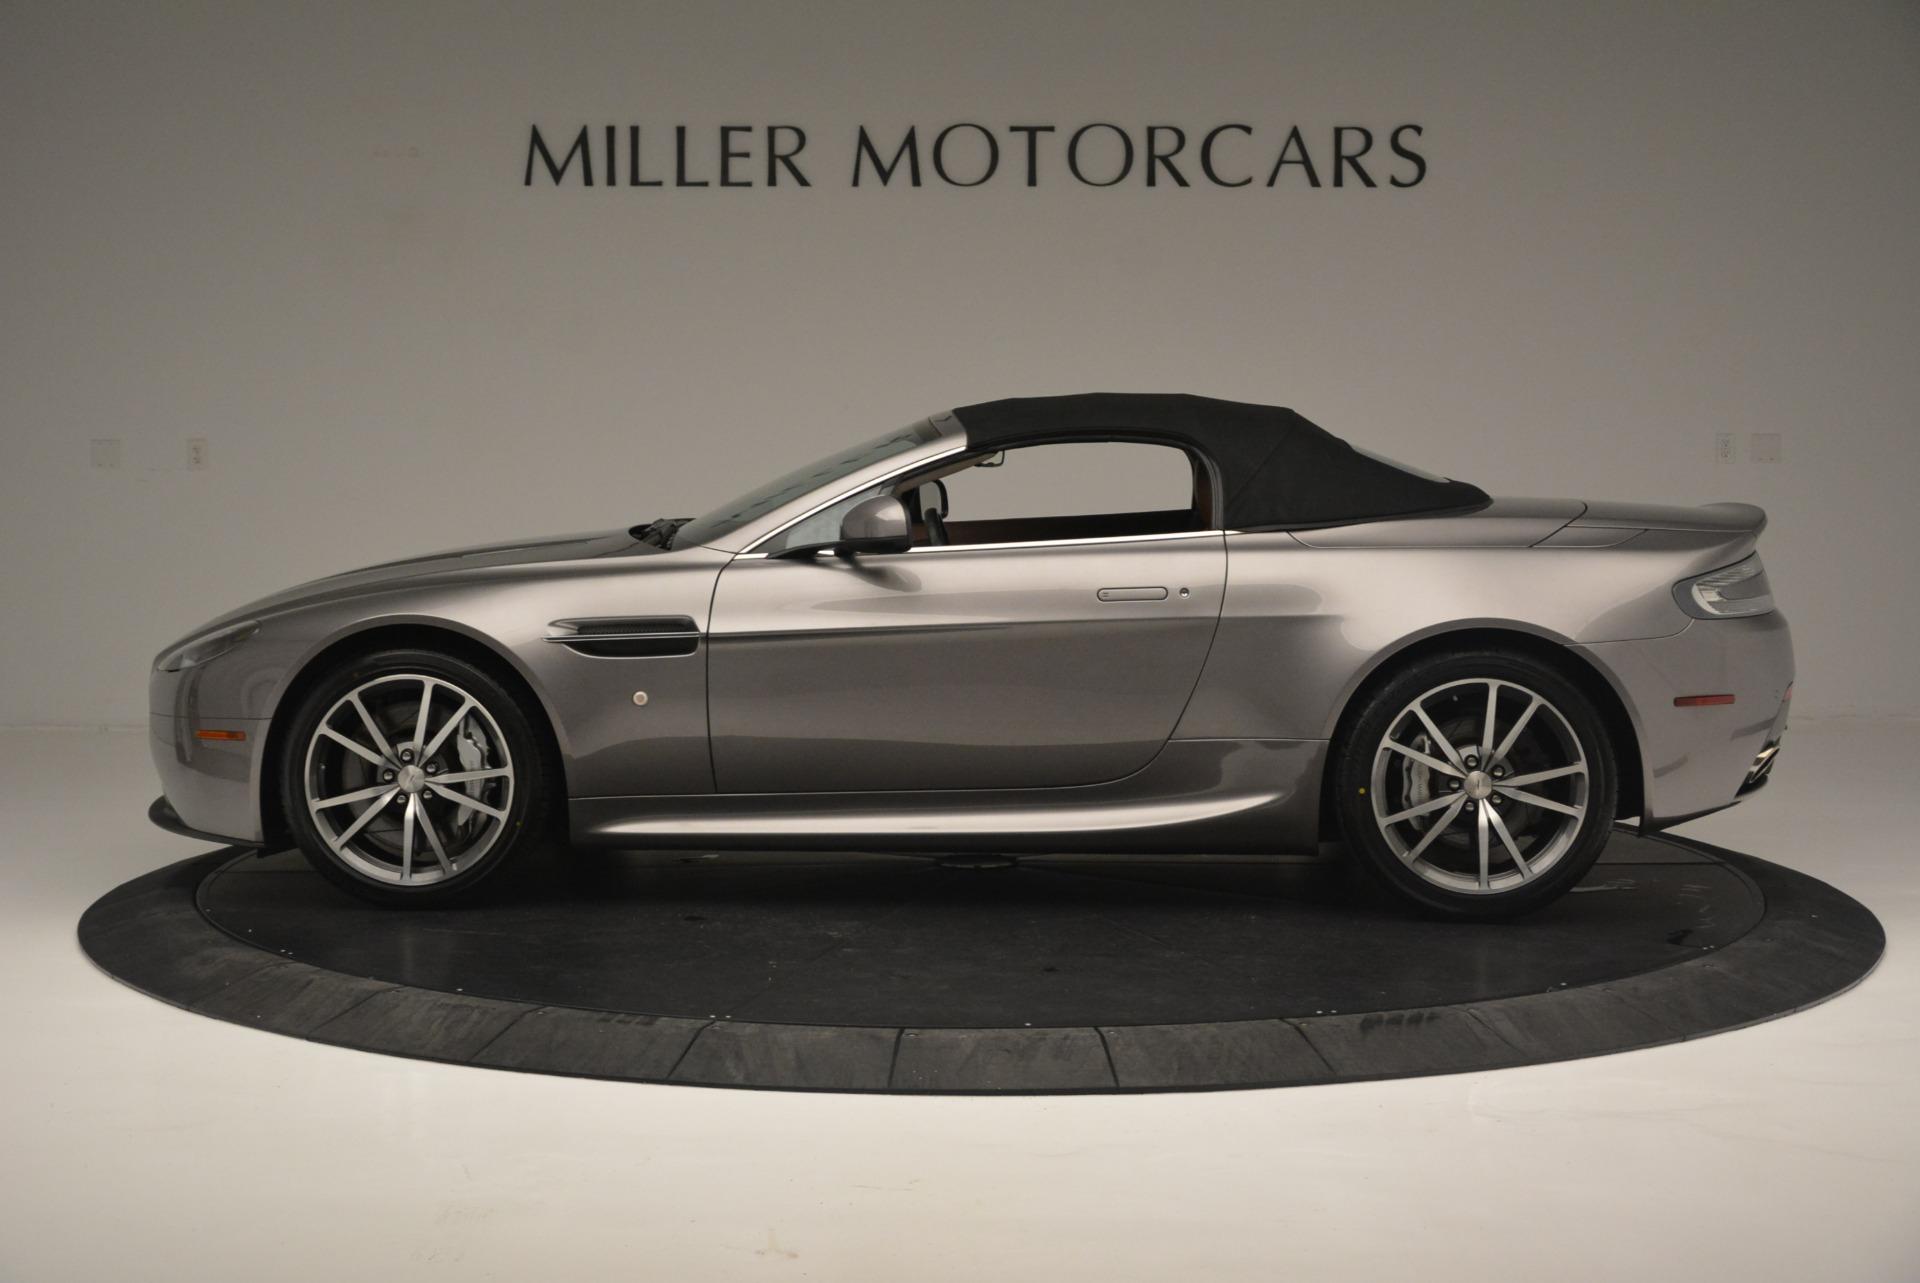 Used 2015 Aston Martin V8 Vantage Roadster For Sale In Westport, CT 2463_p15